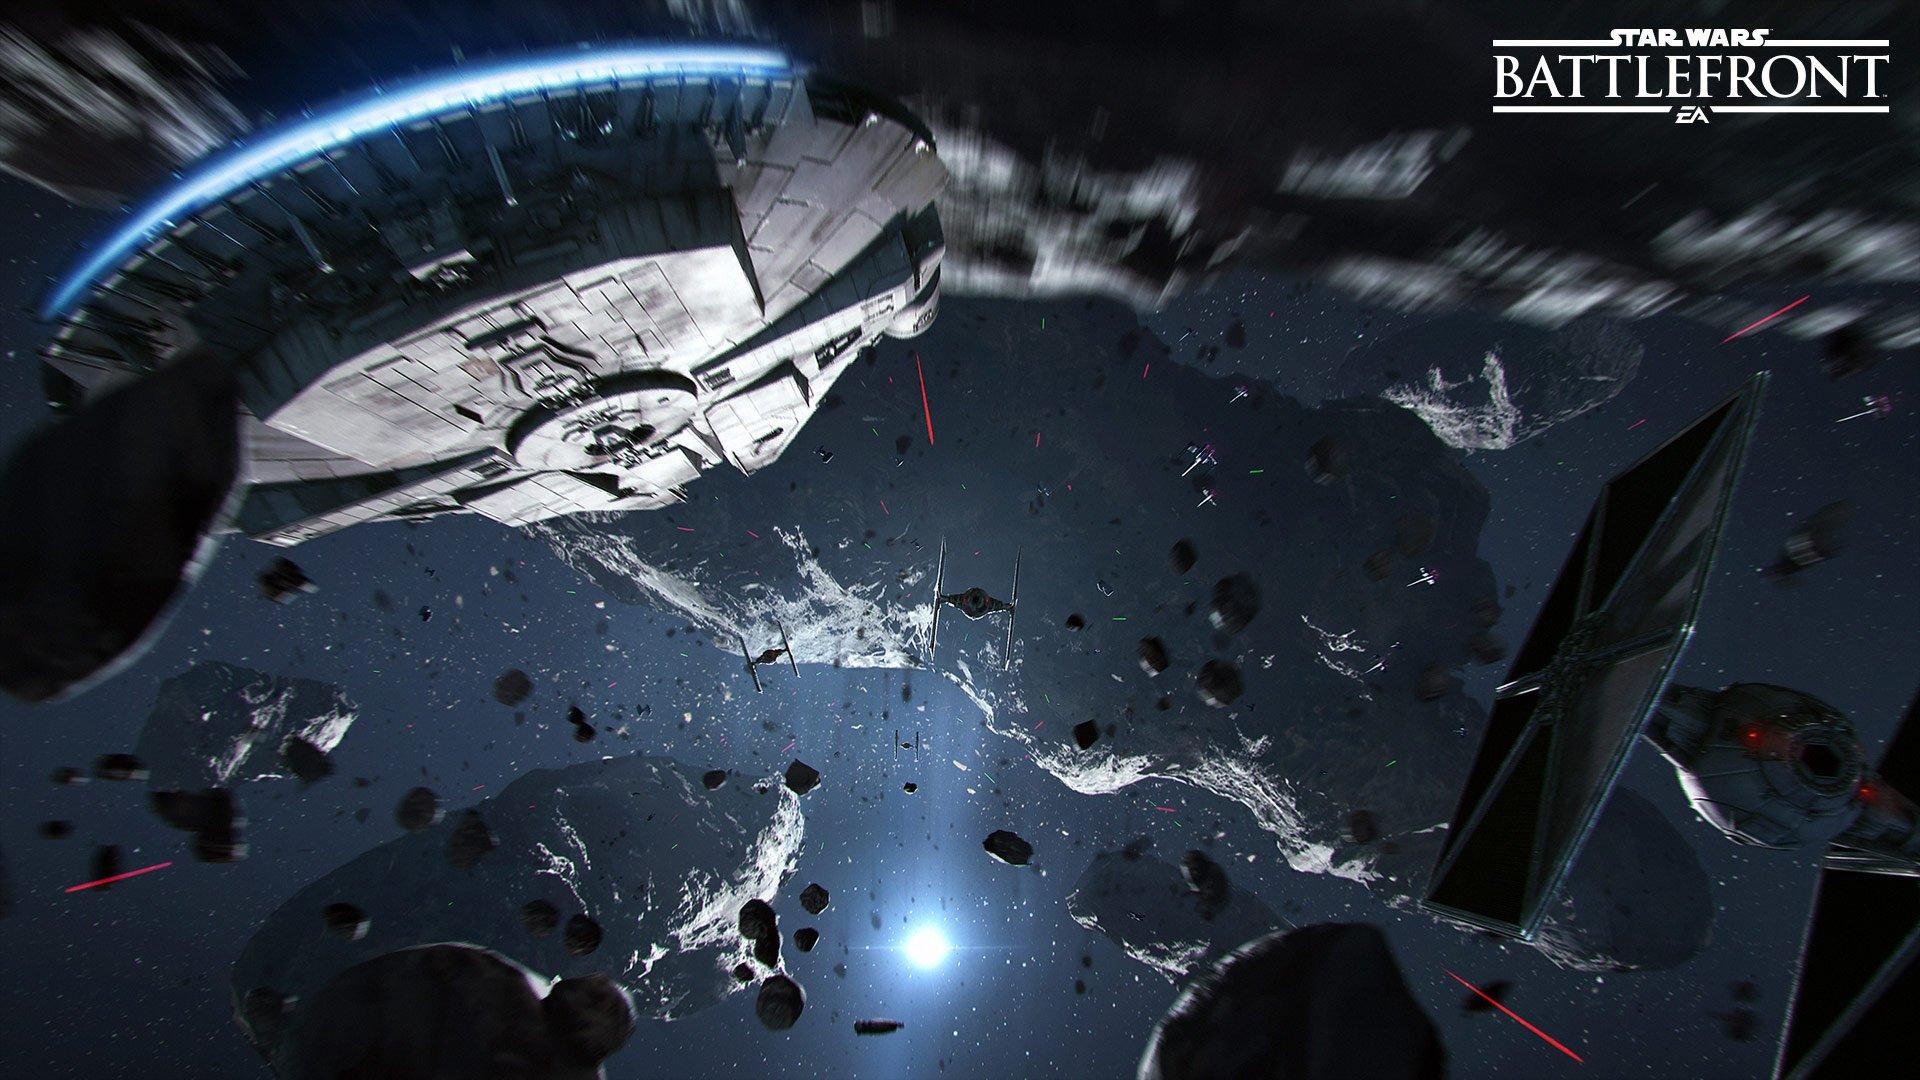 Star Wars Battlefront: Death Star review